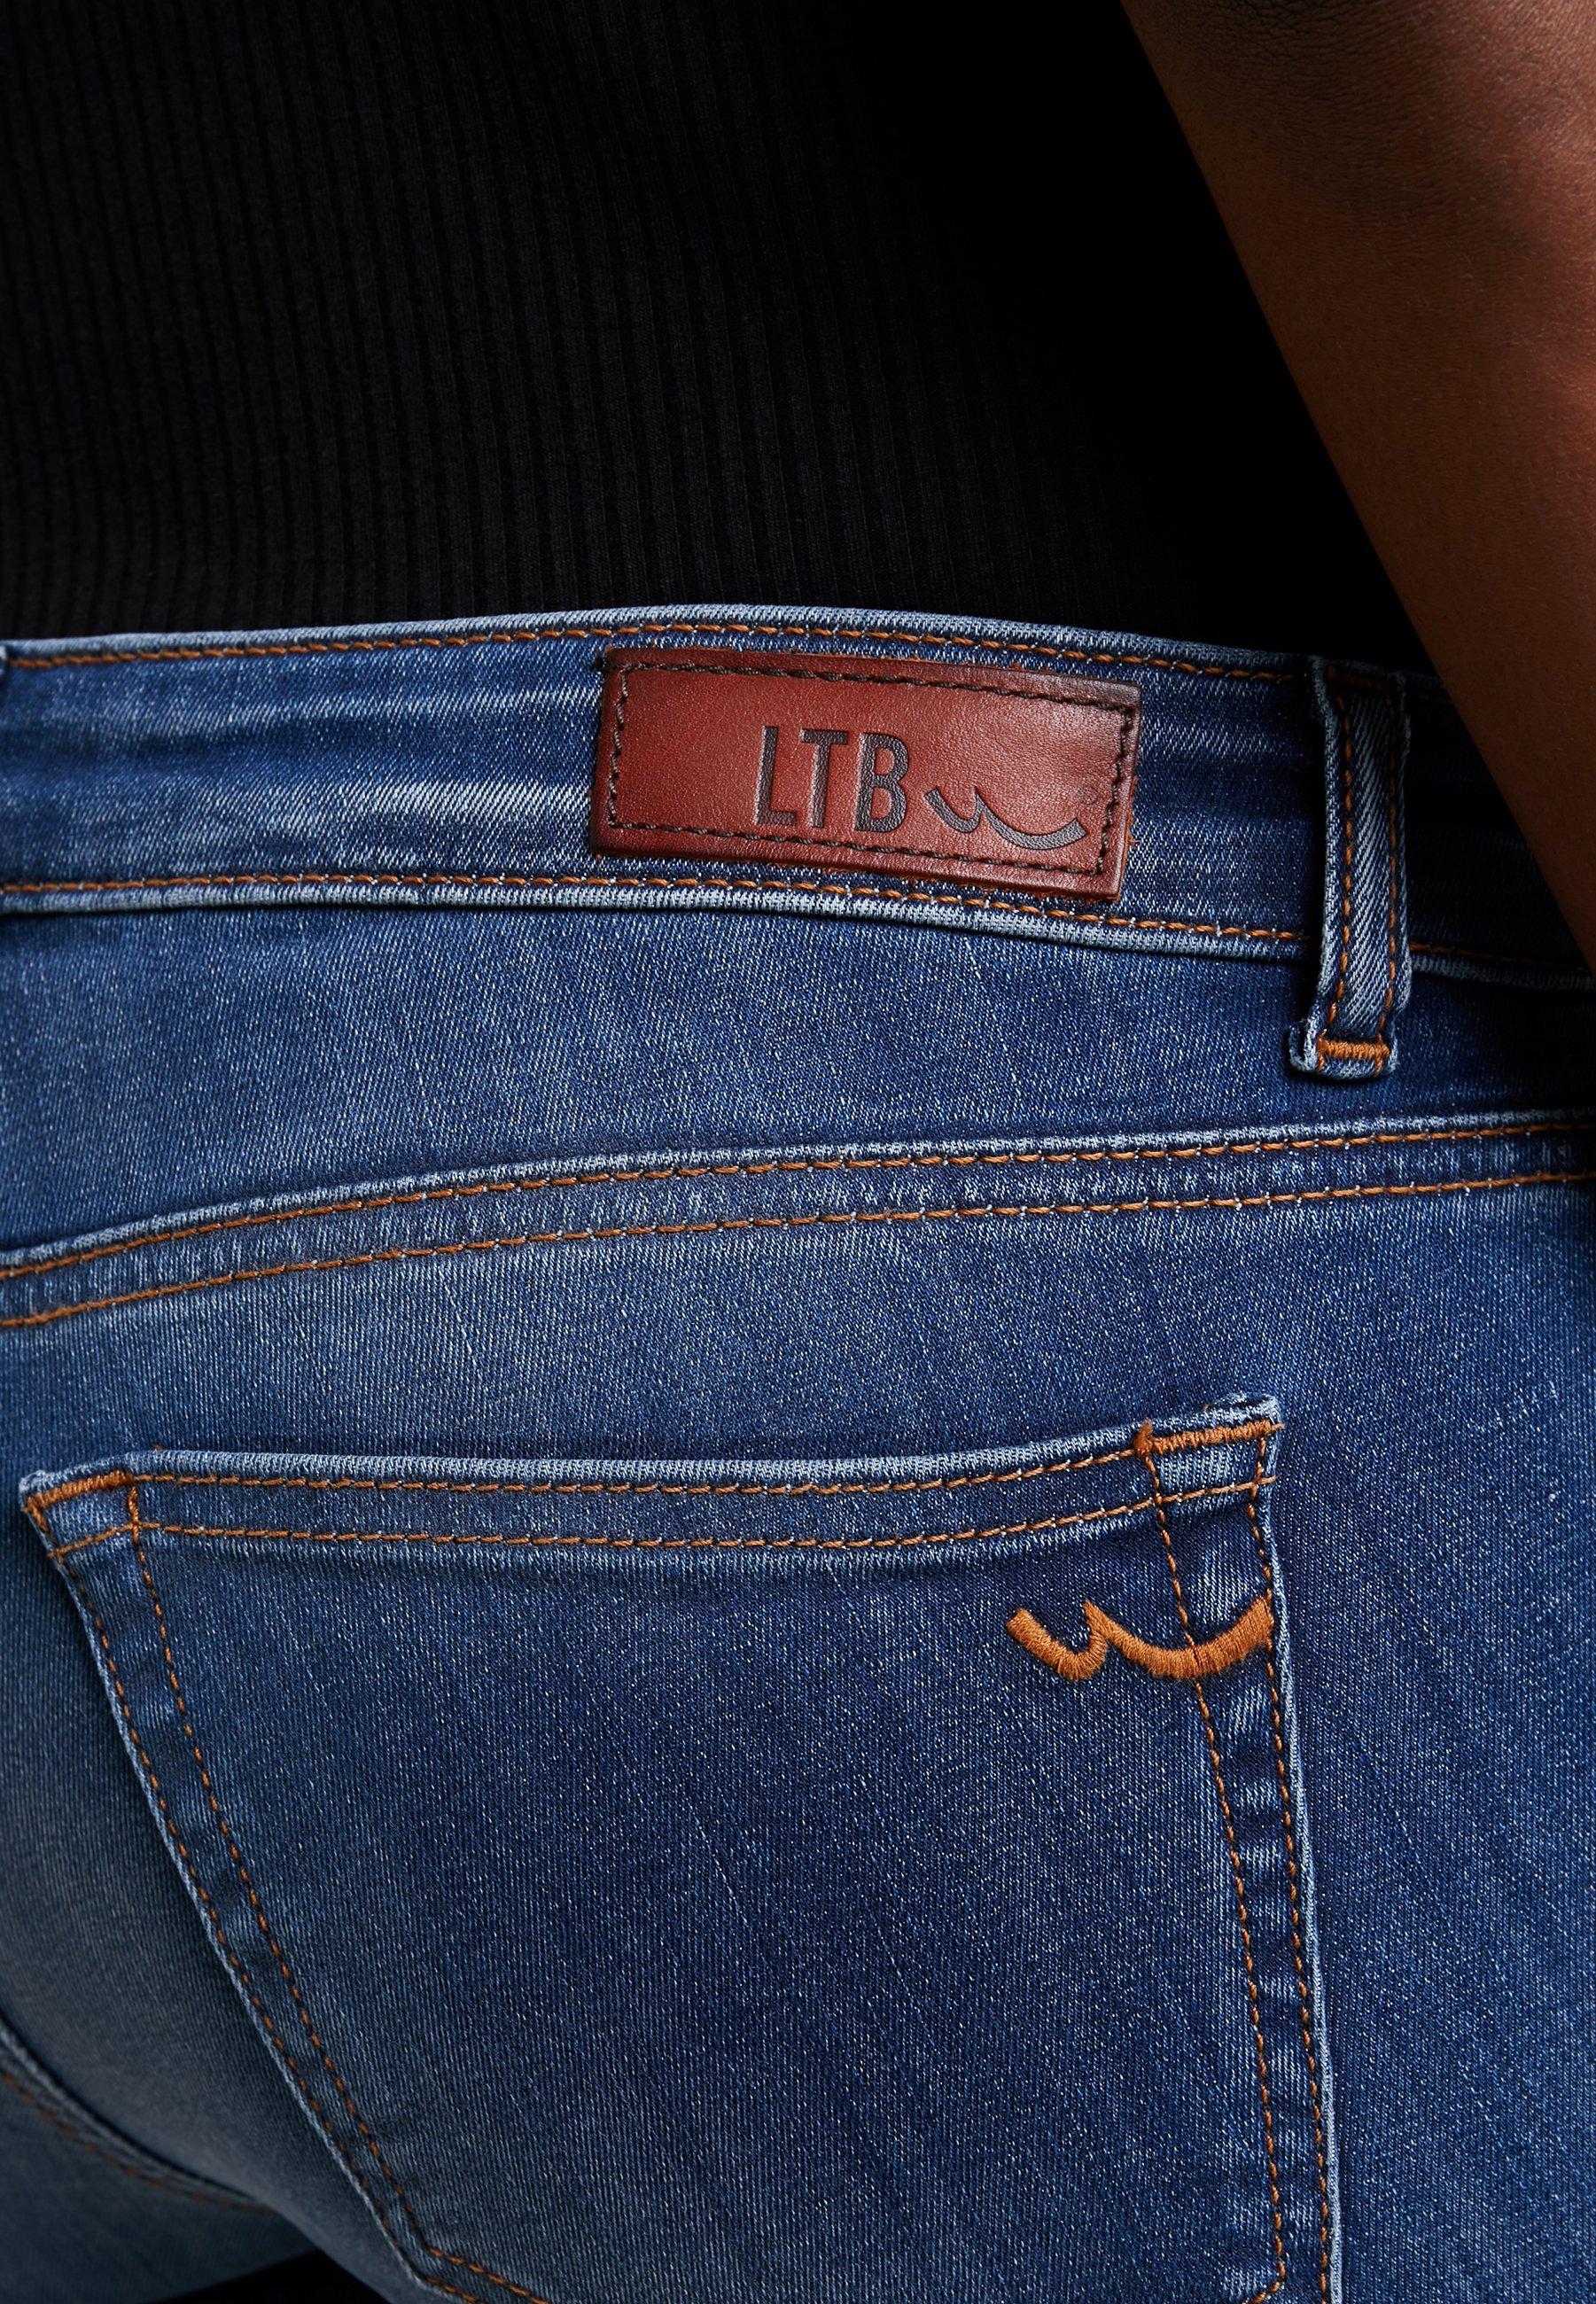 LTB MINA - Jeans Skinny Fit lanel wash